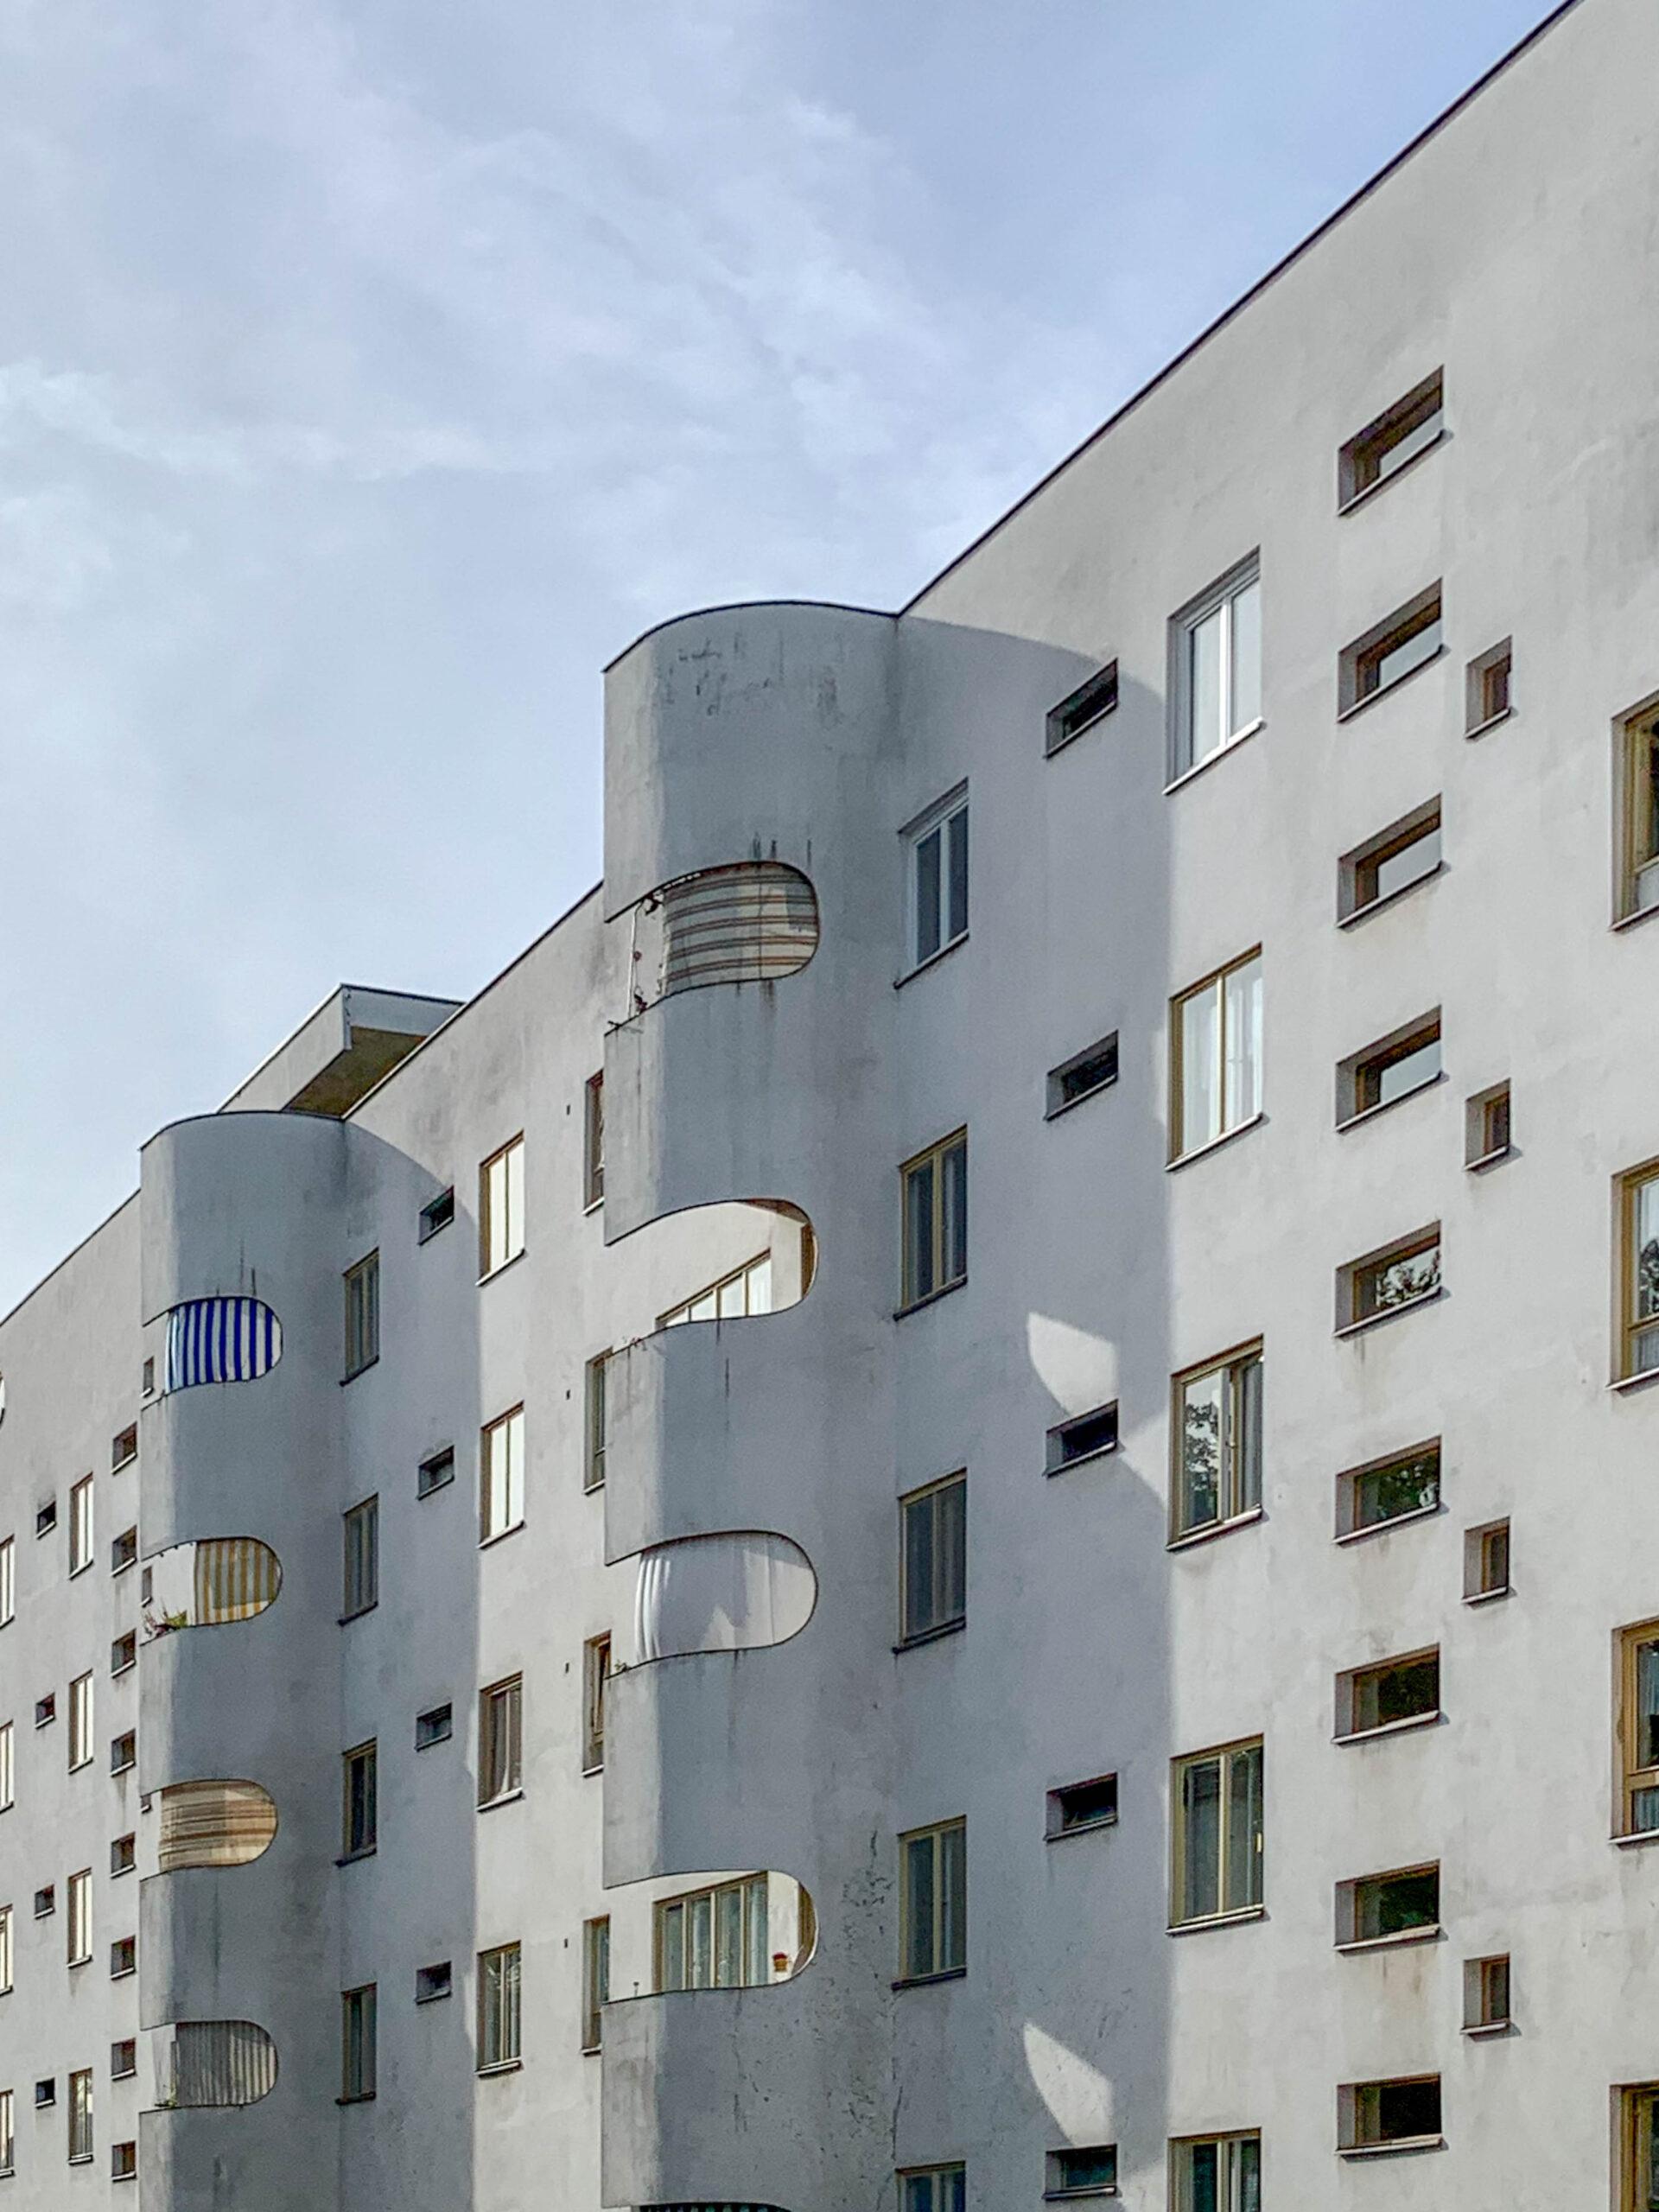 Residential complexPanzerkreuzer, 1929-1930. Architect: Hans Scharoun